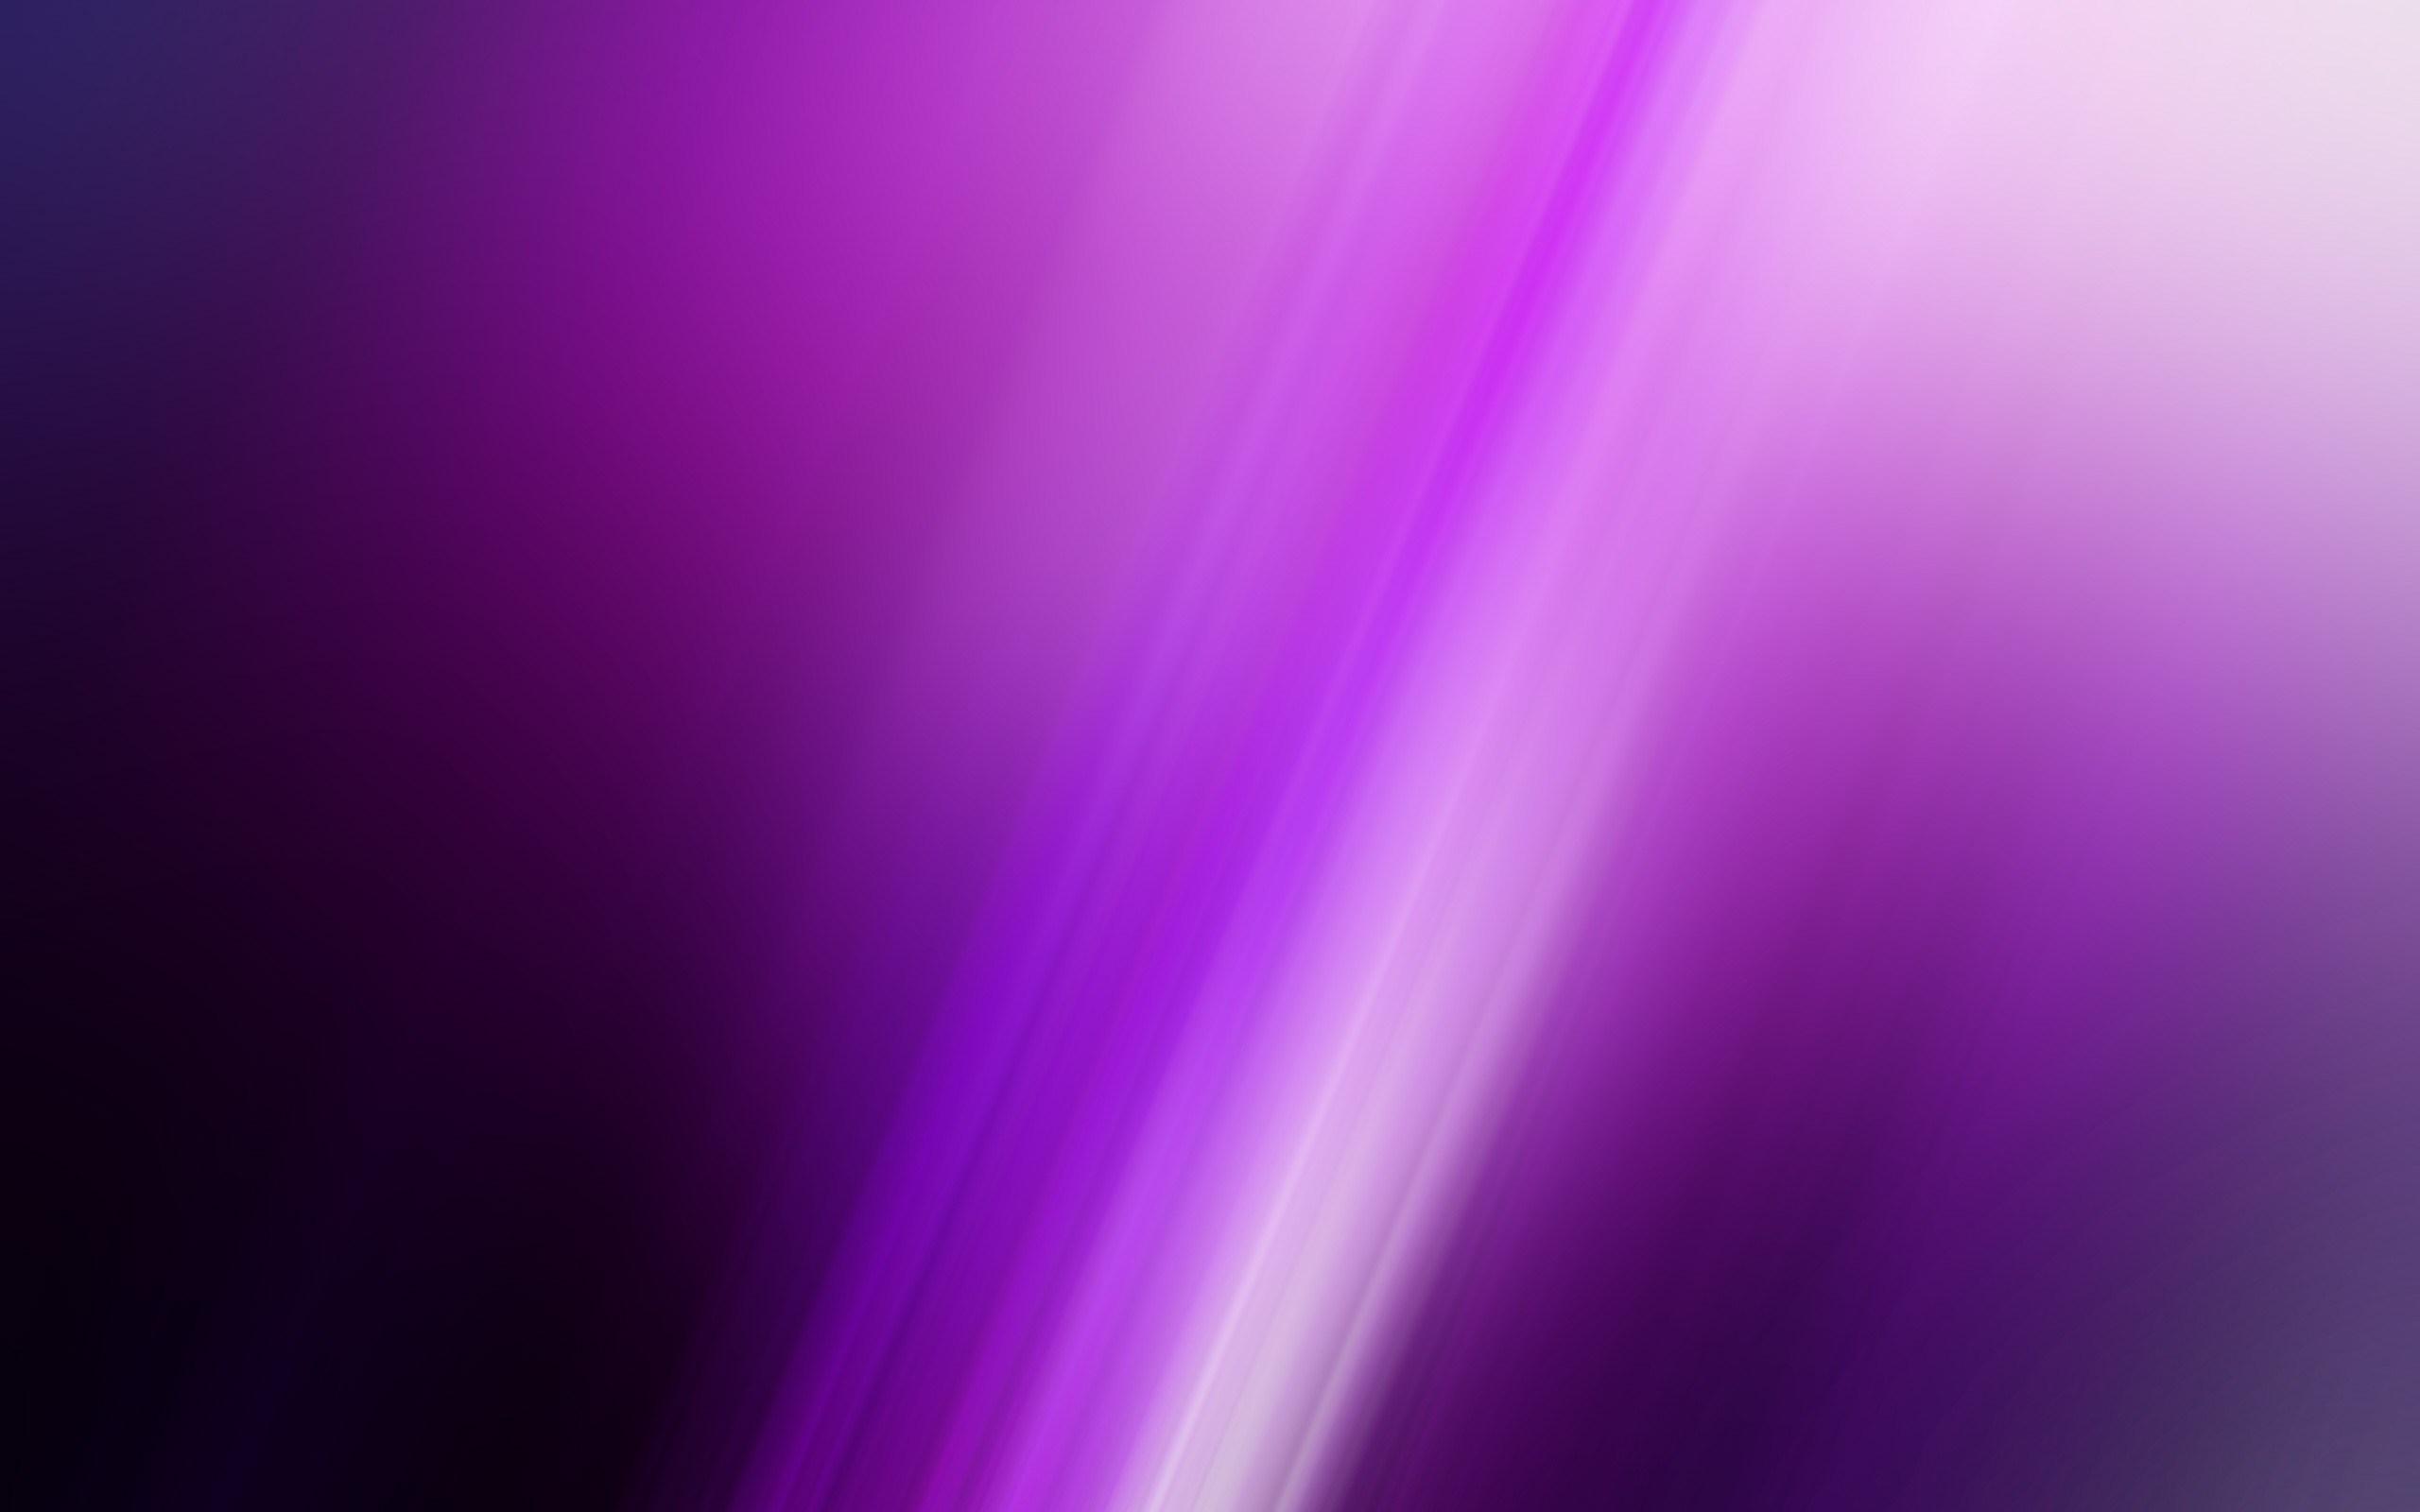 desktop wallpaper backgrounds abstract purple computer 2560x1600 2560x1600